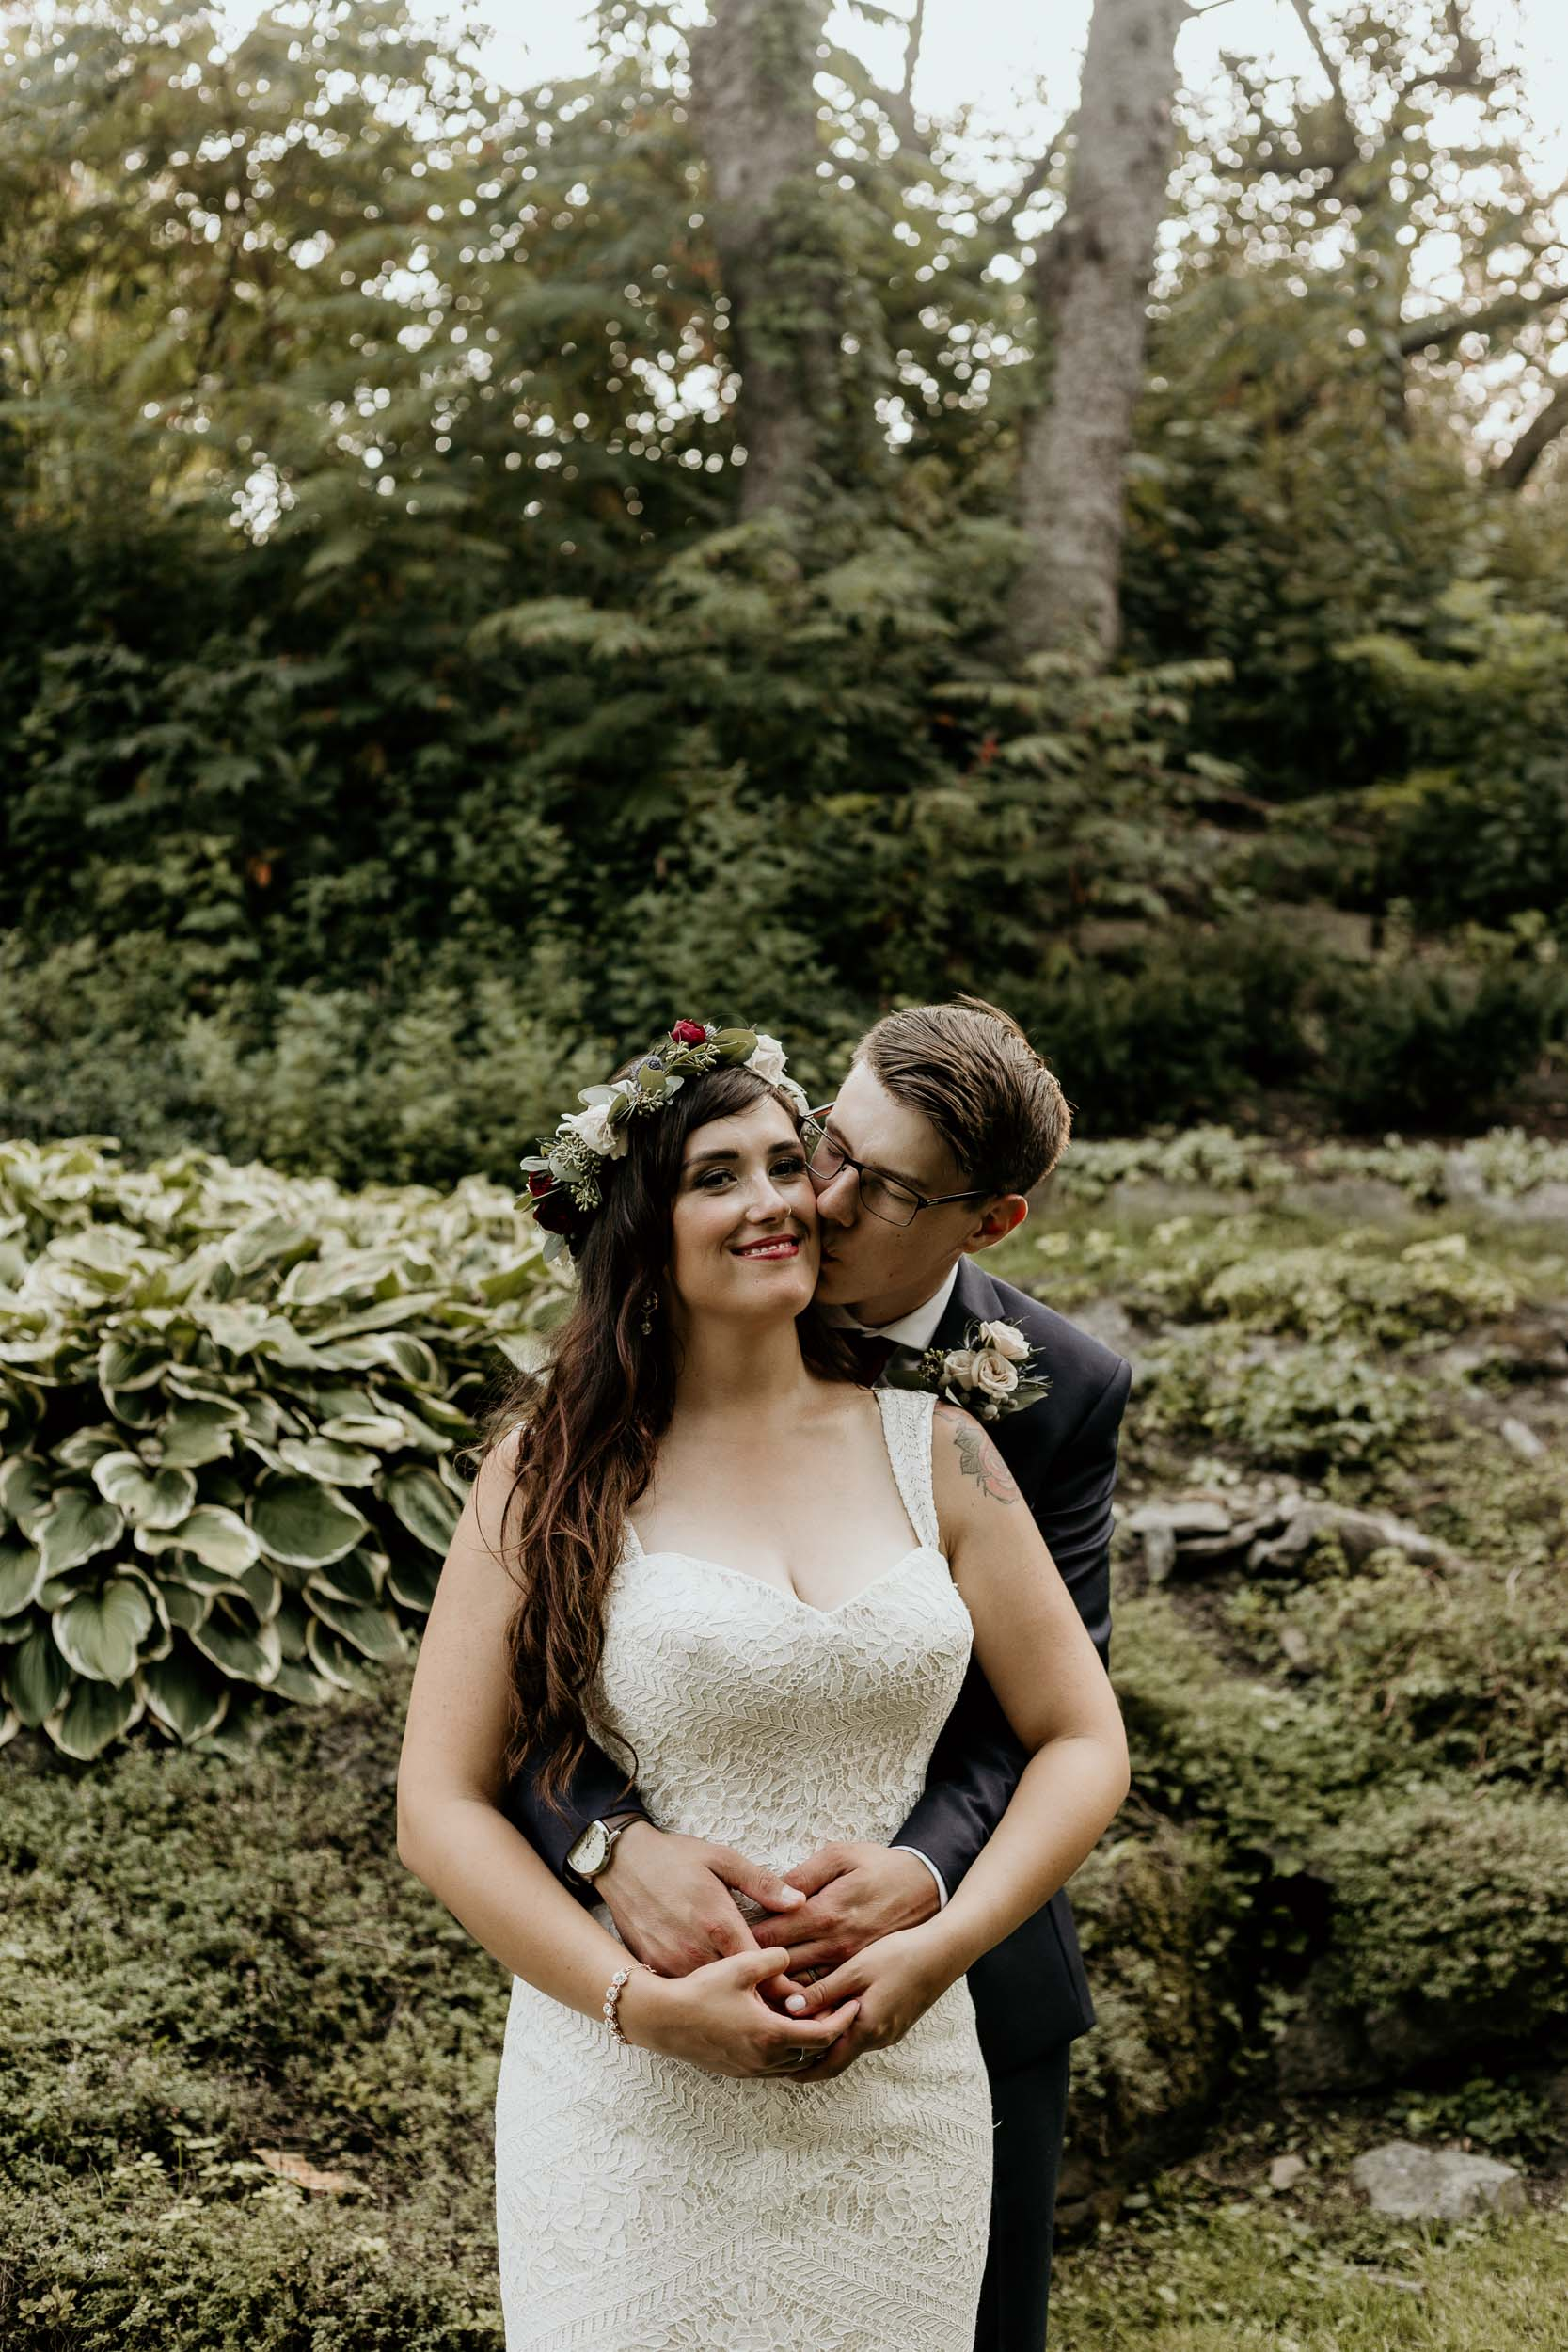 intimate-wedding-elopement-photographer-ottawa-toronto-7763.jpg